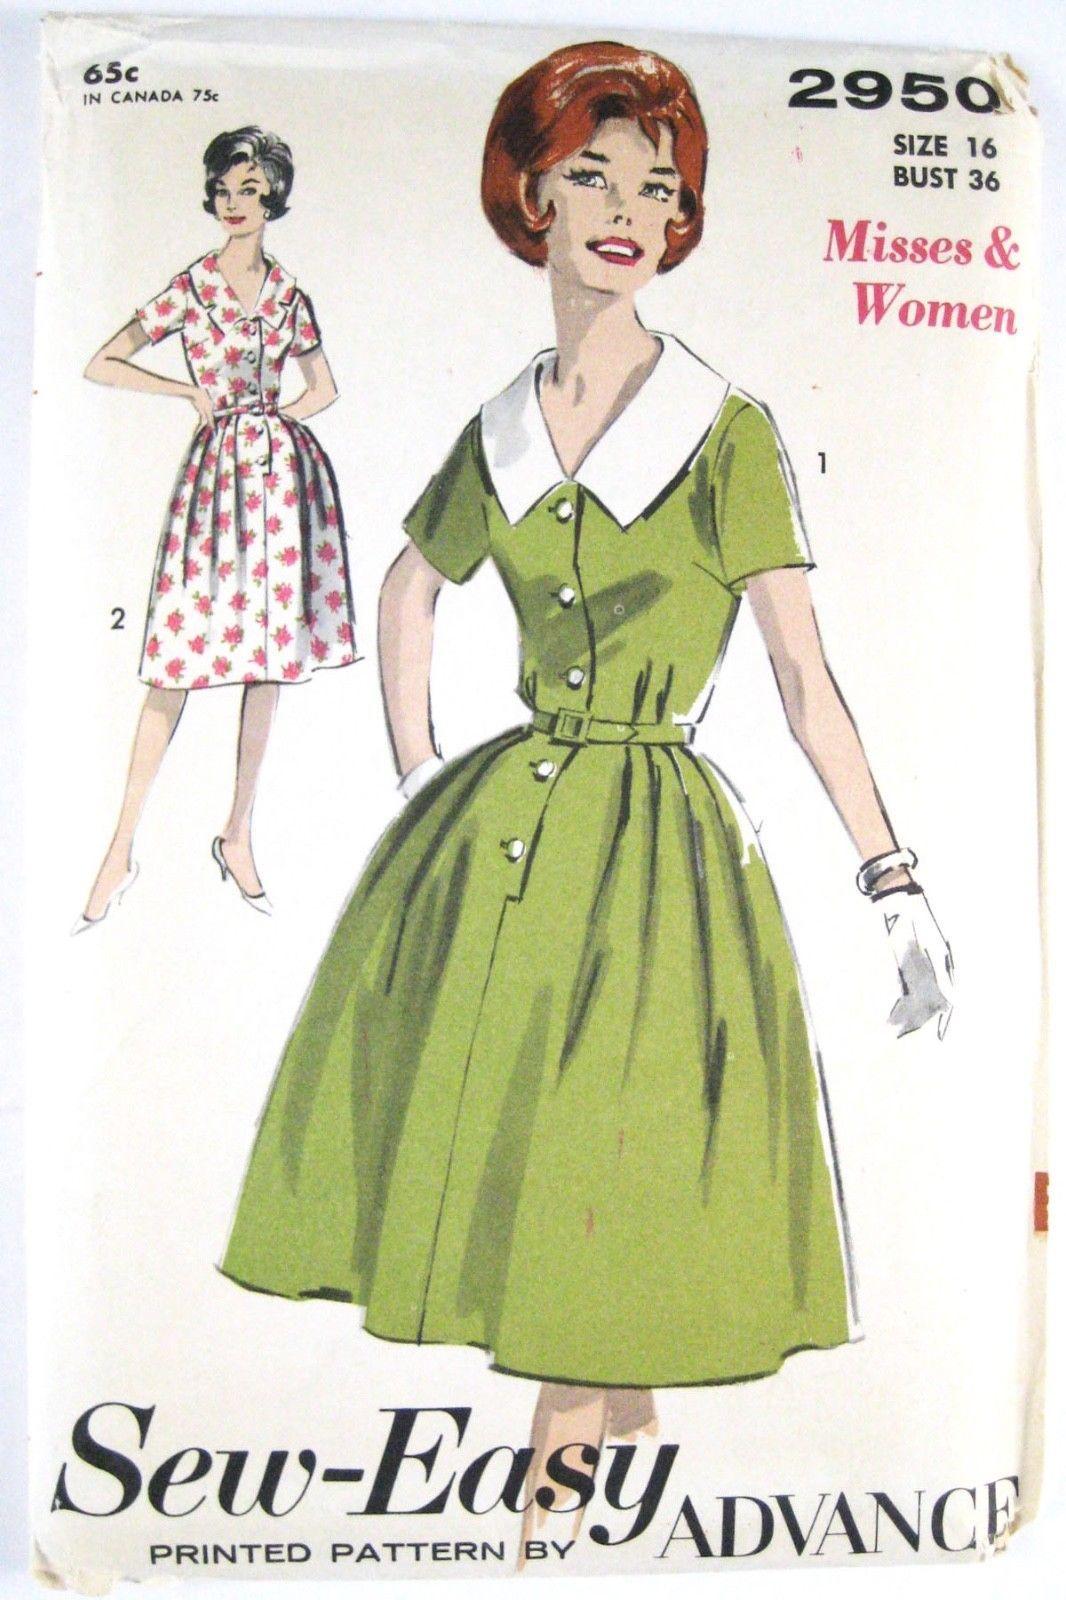 Vintage 60s Advance 2950 Misses Shirtwaist Dress Short Sleeve V-Neck 16/36 image 2